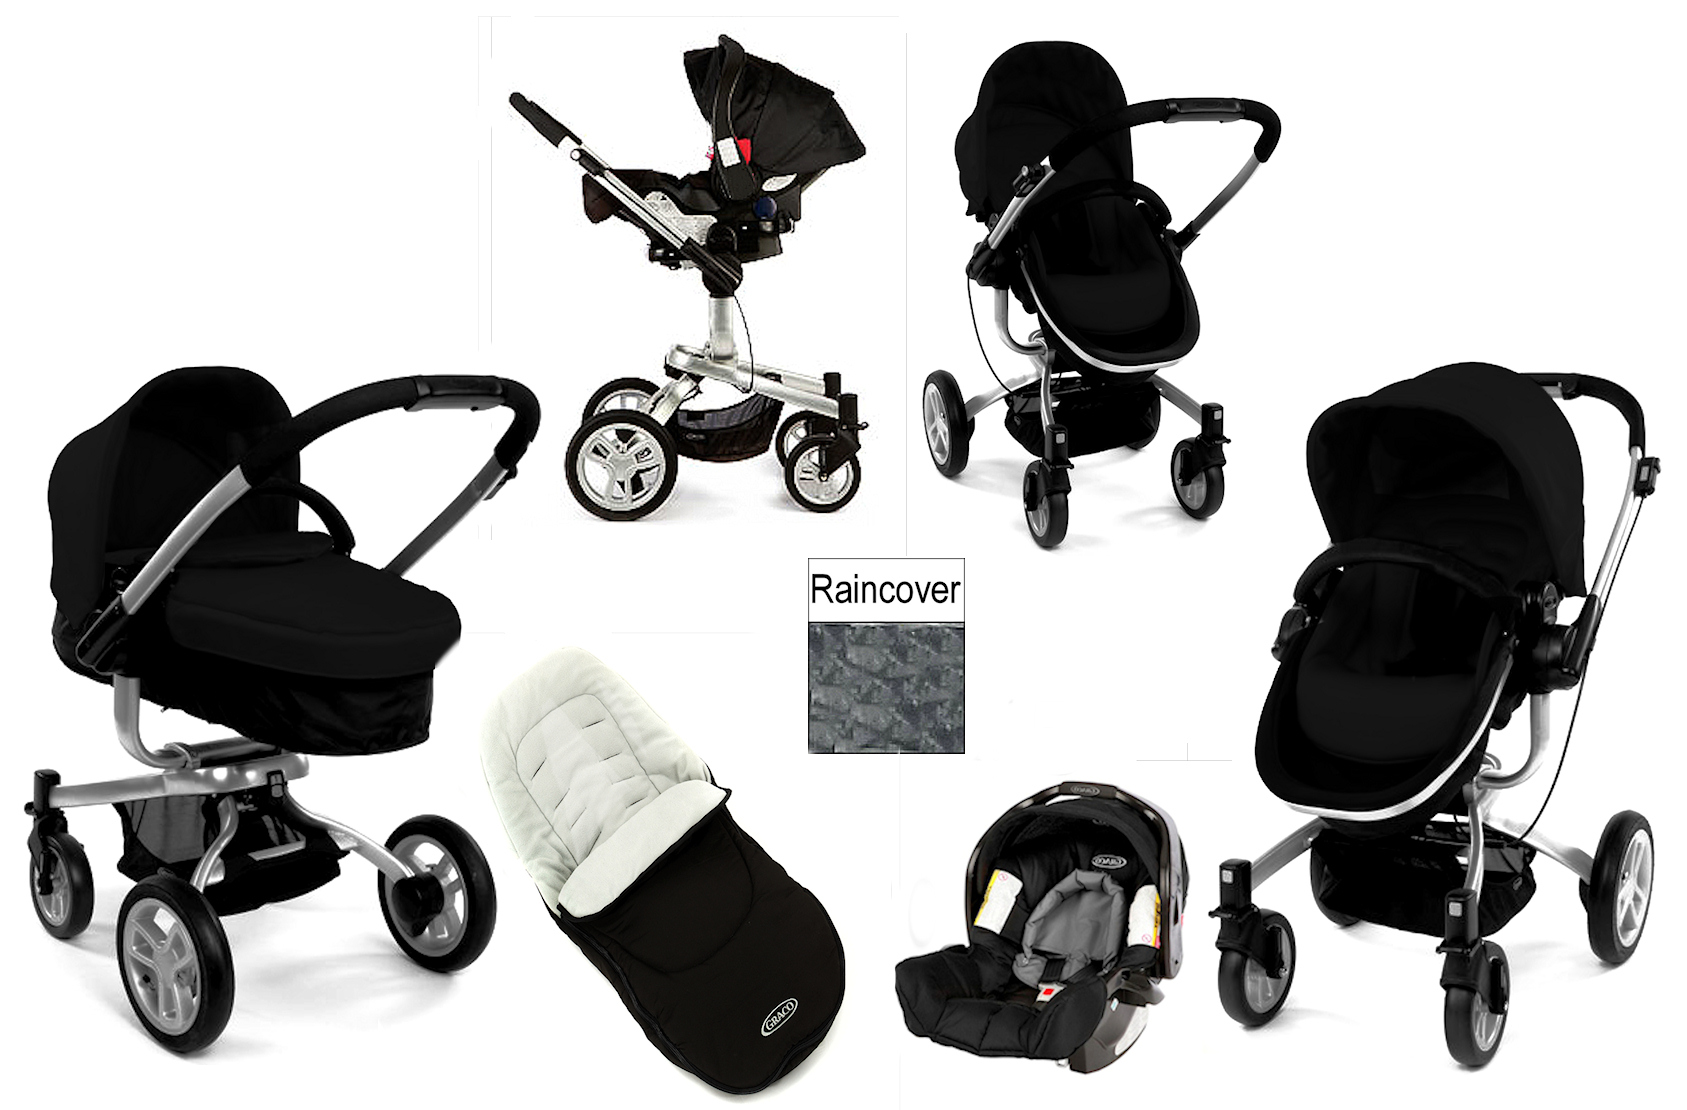 GRACO-URBAN-BLACK-SYMBIO-B-TRAVEL-SYSTEM-PRAM-PUSHCHAIR-JUNIOR-BABY-CAR-SEAT